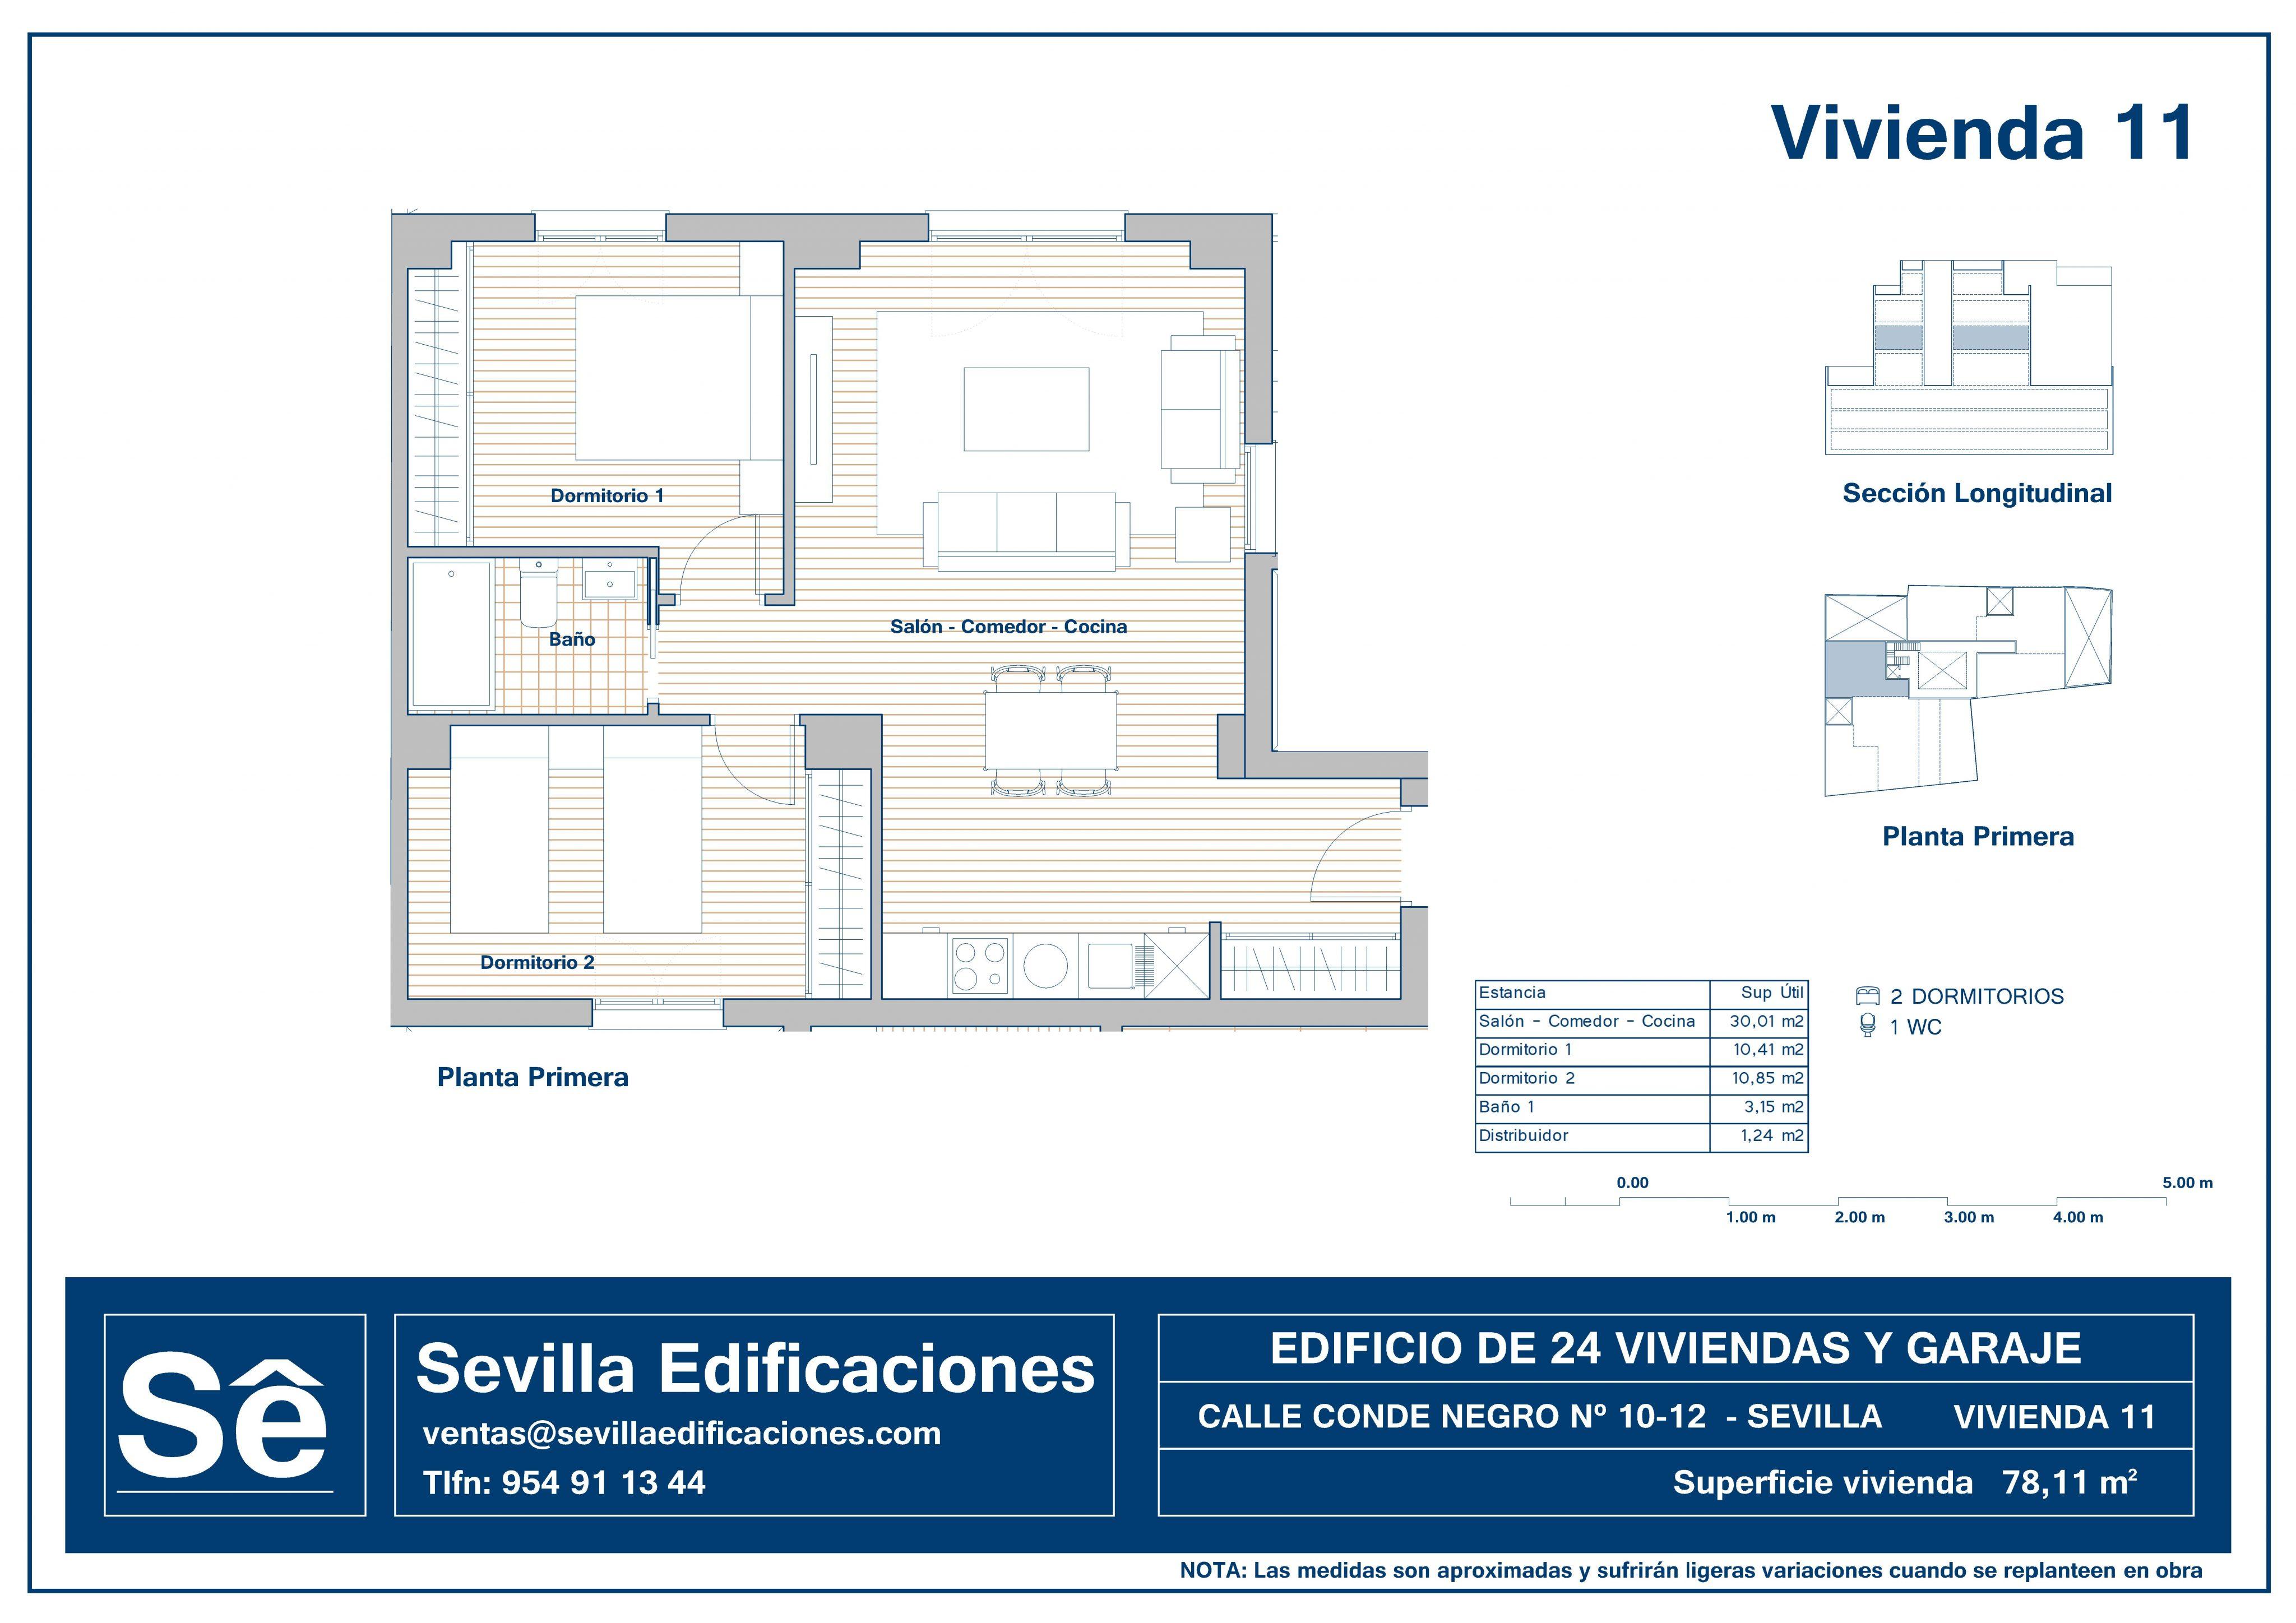 CONDENEGRO_VIVIENDA_11